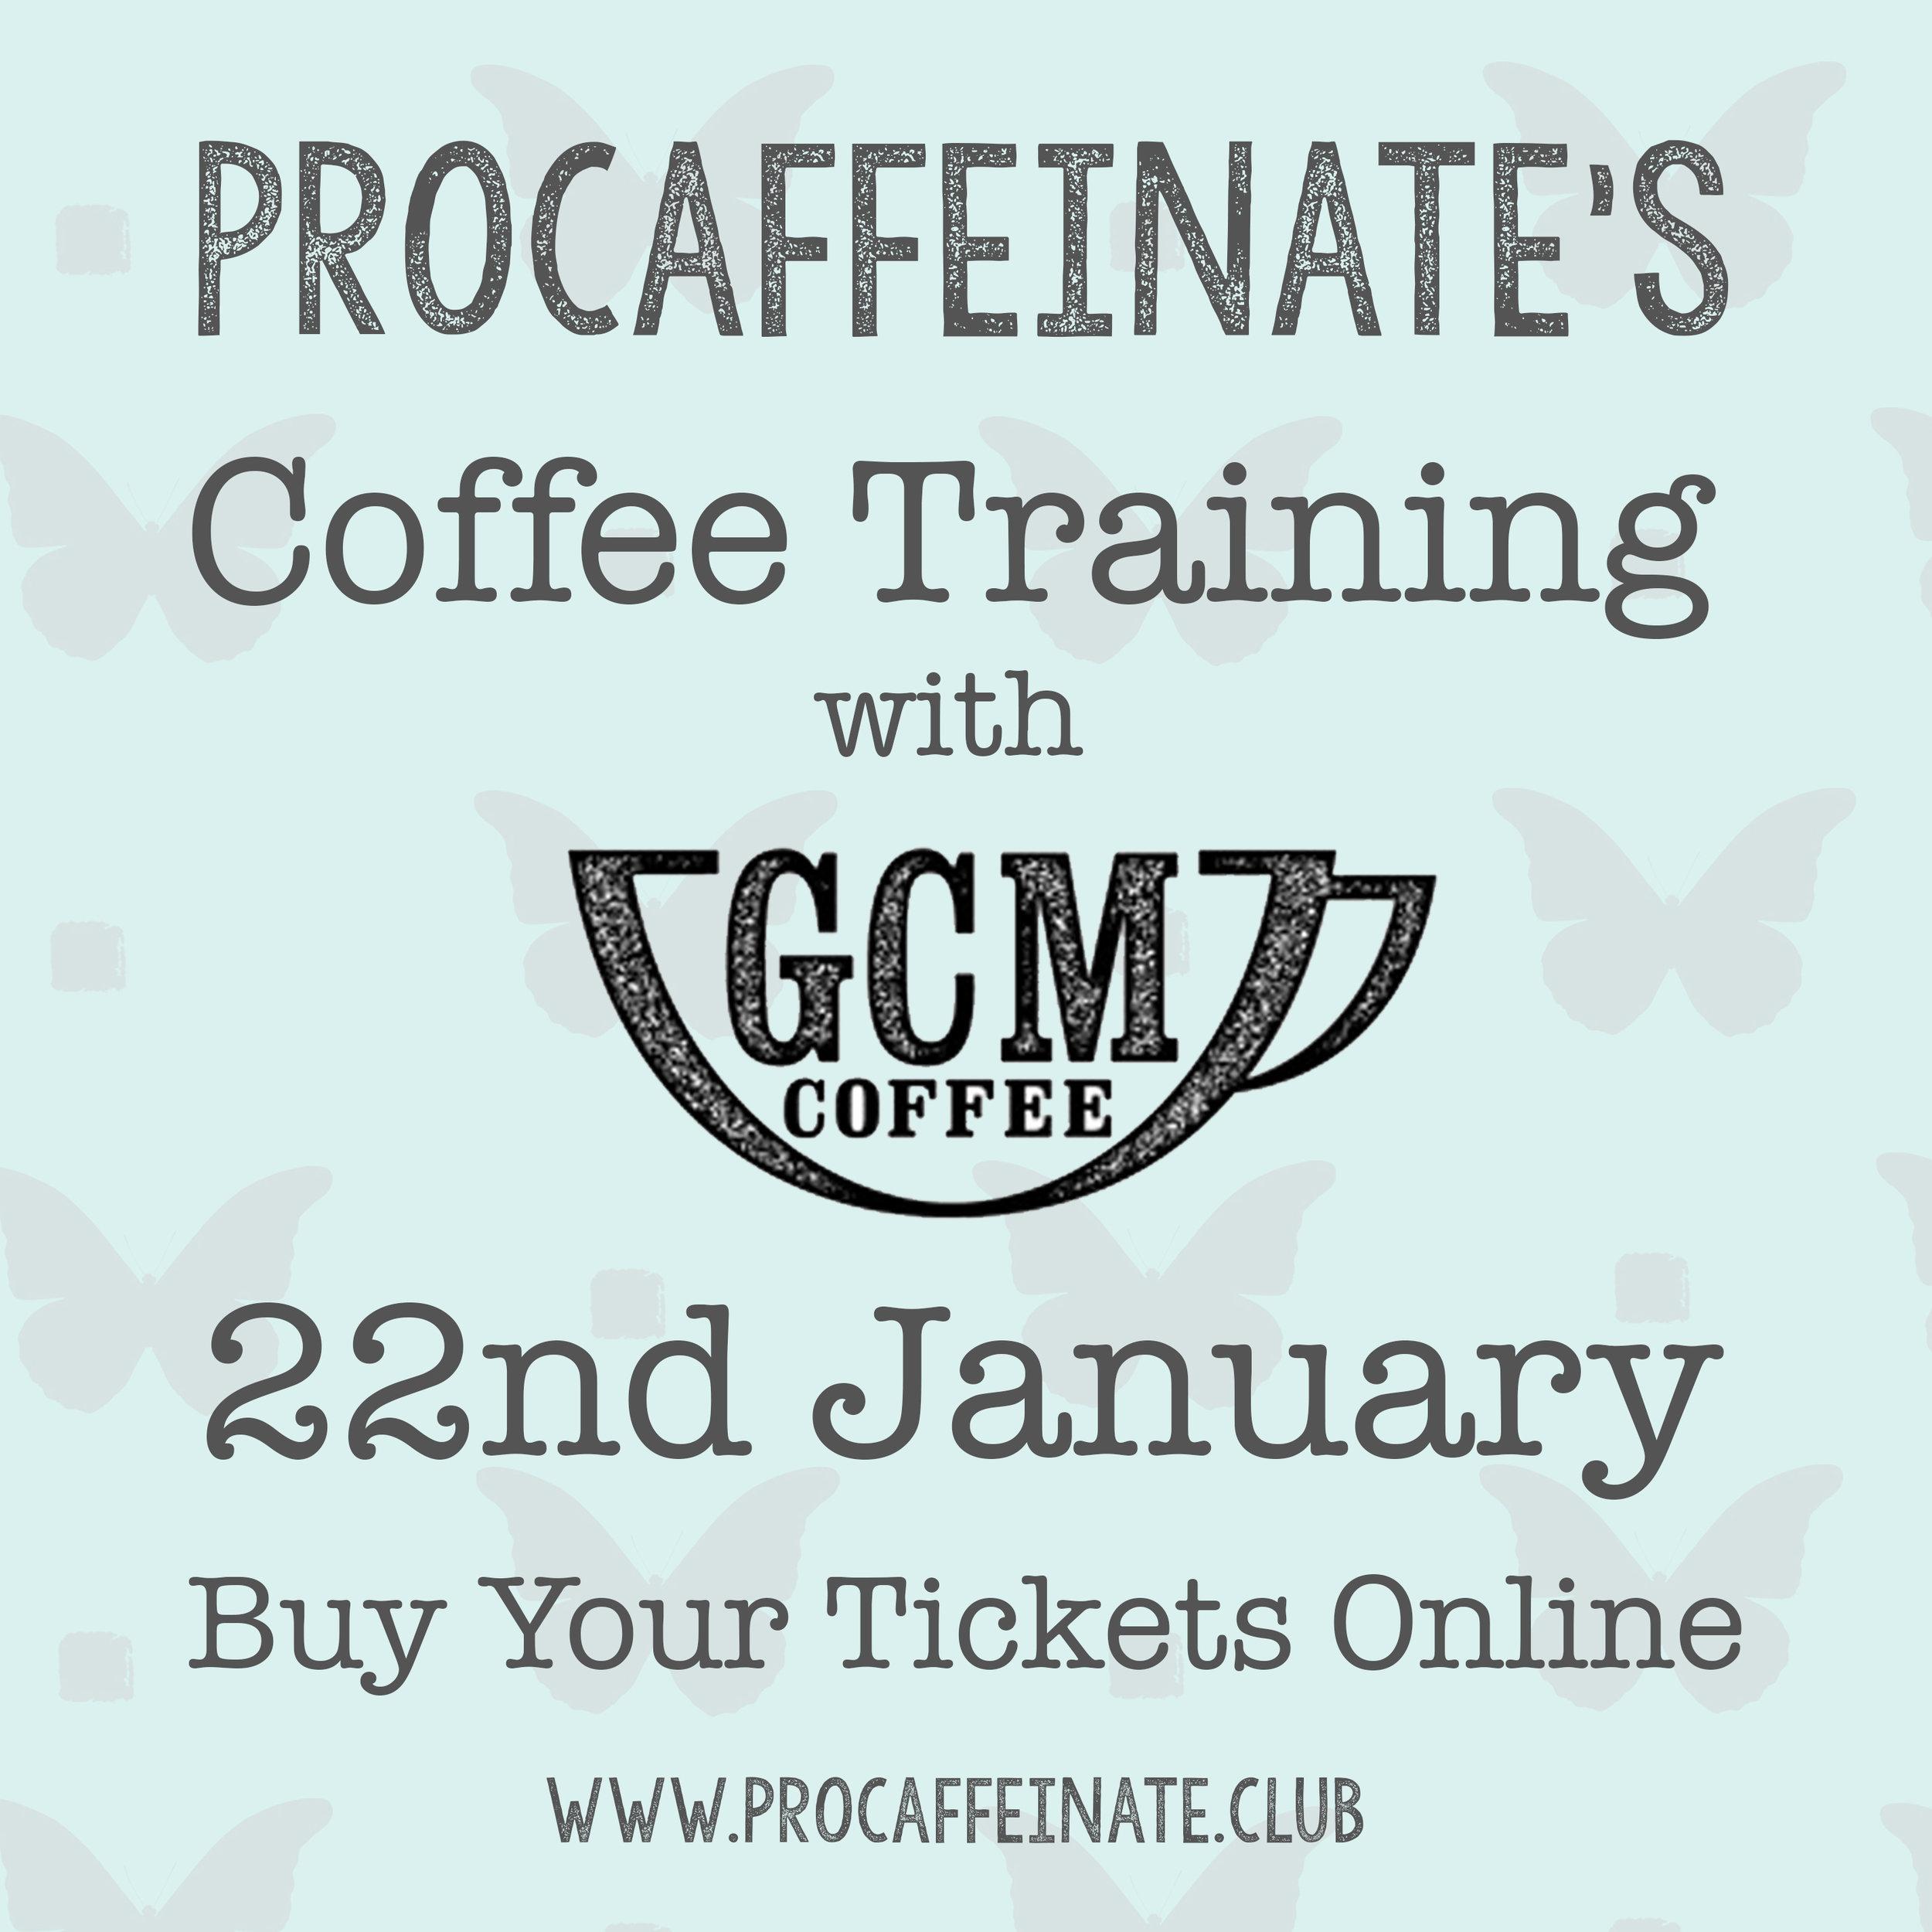 coffe training square.jpg